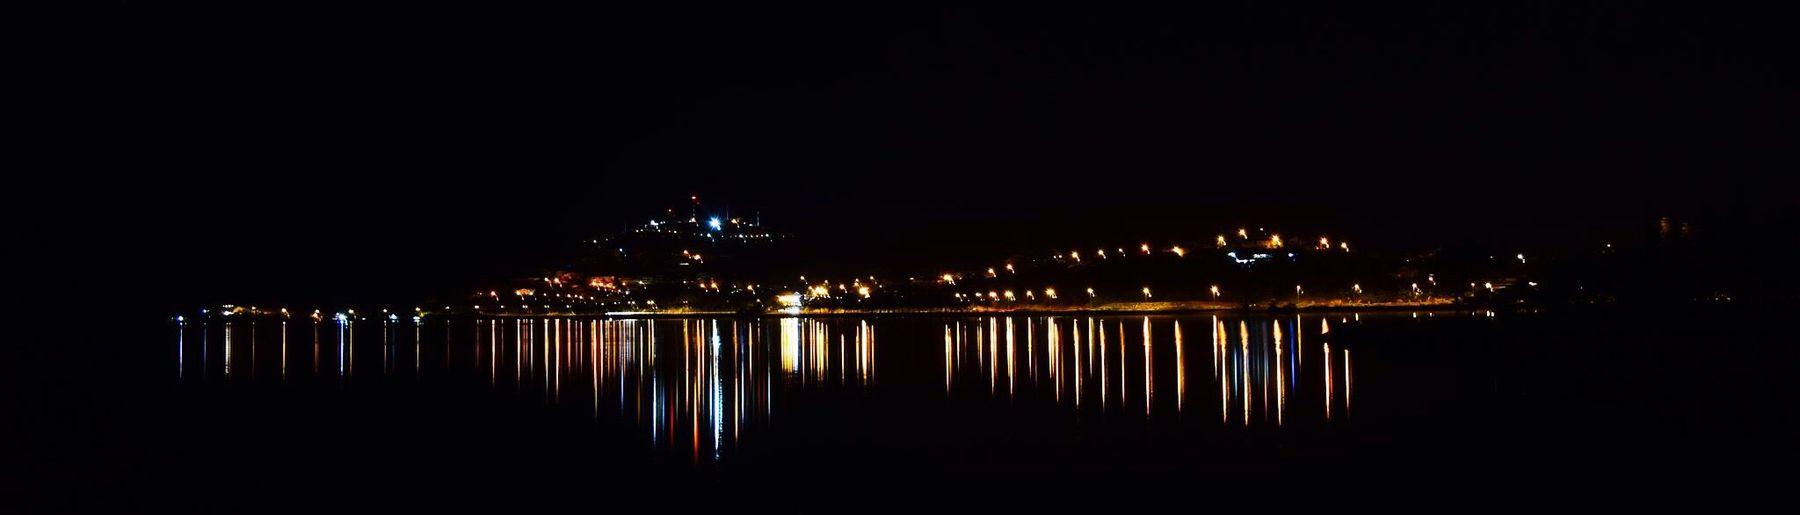 Lights Reflection Nikon D5300